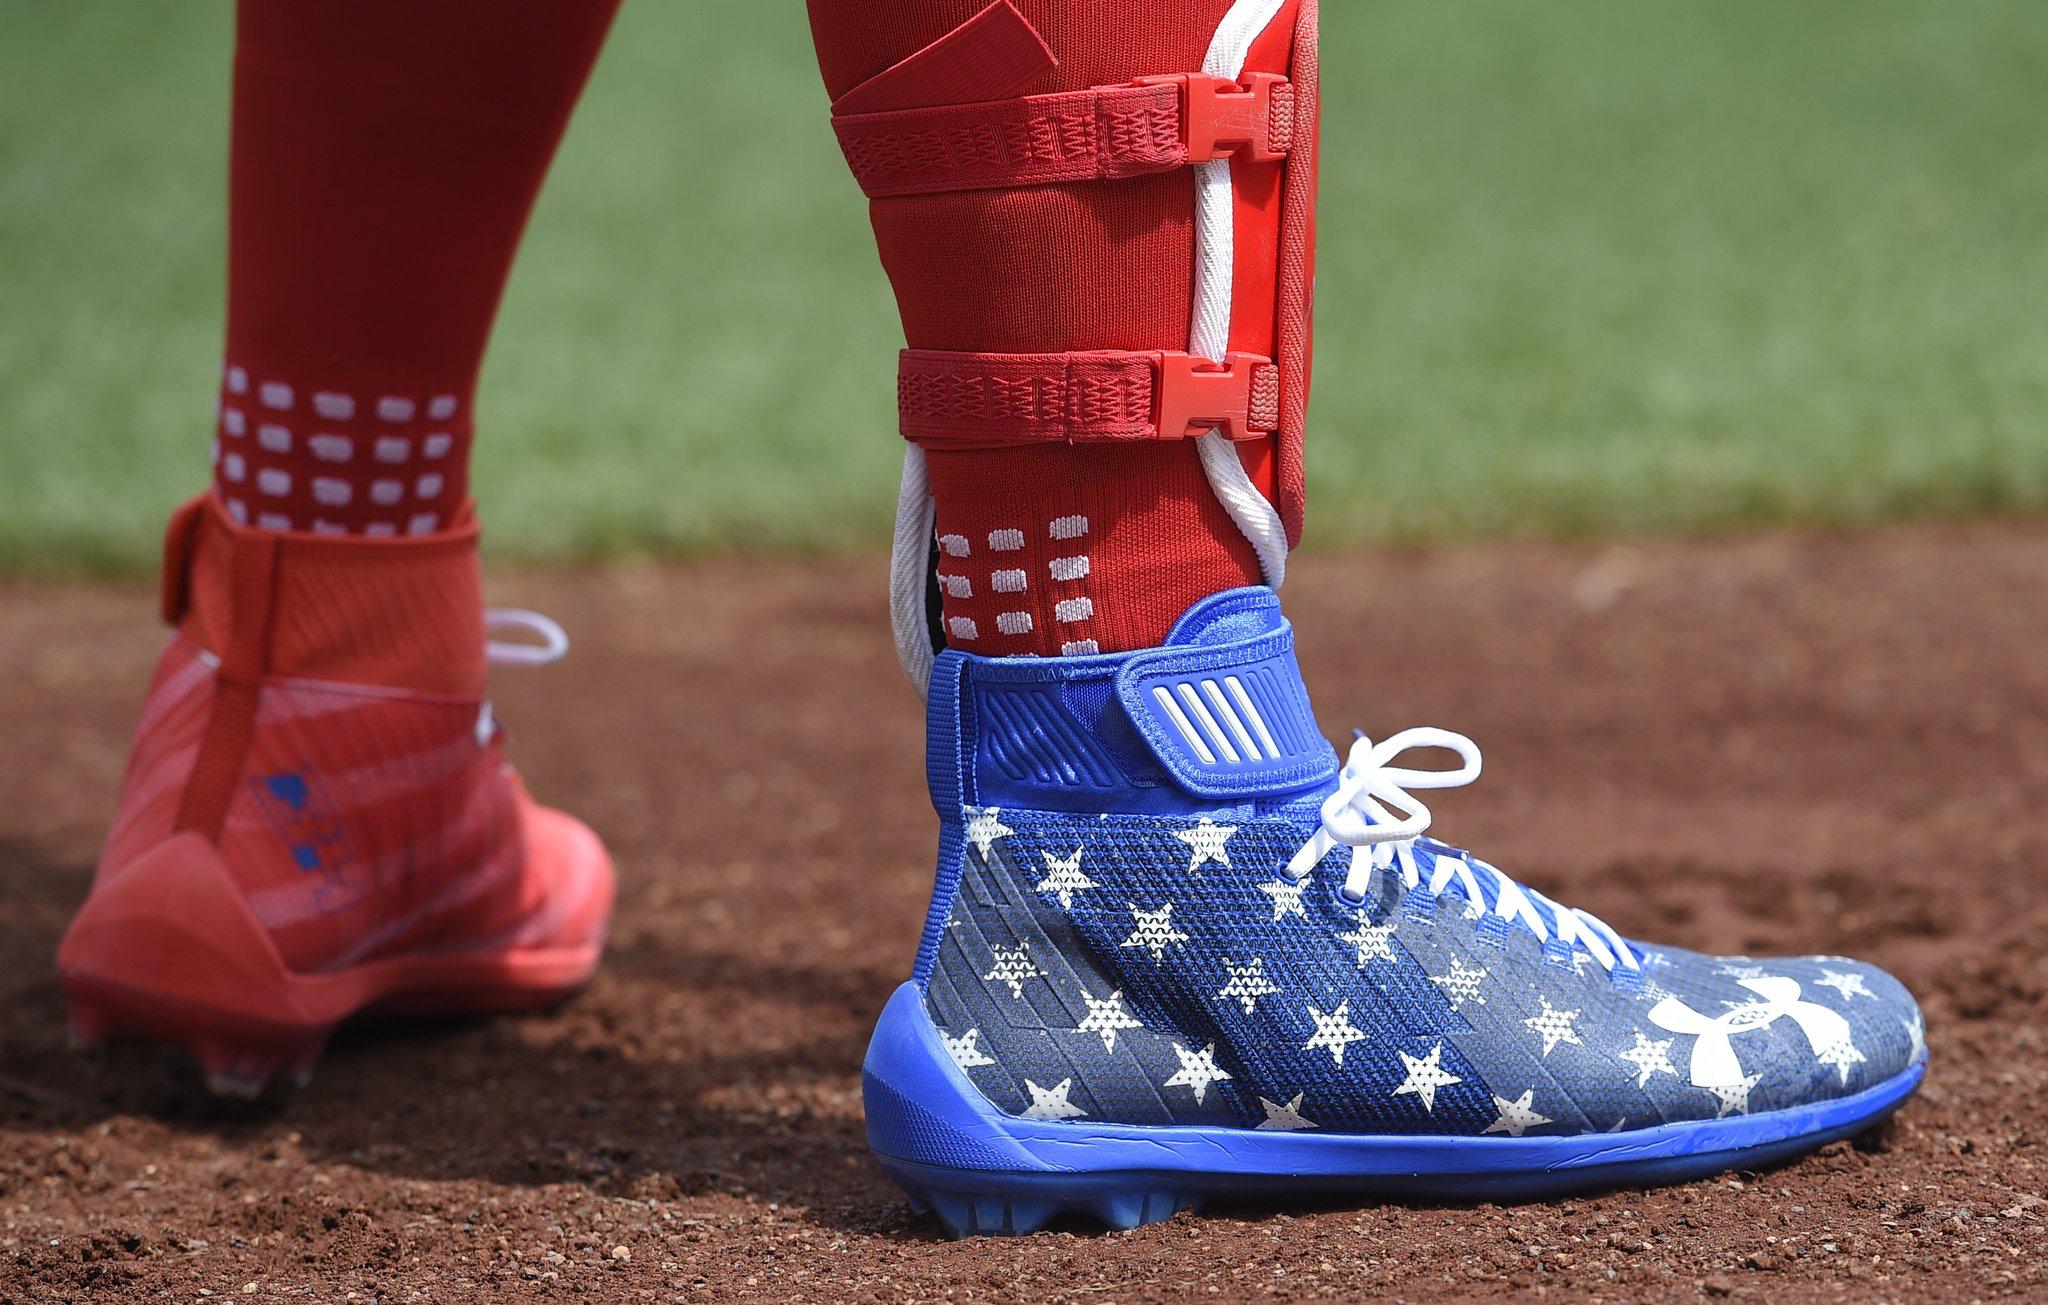 July 4th MLB Rubber rain boots, Rain boots, Boots